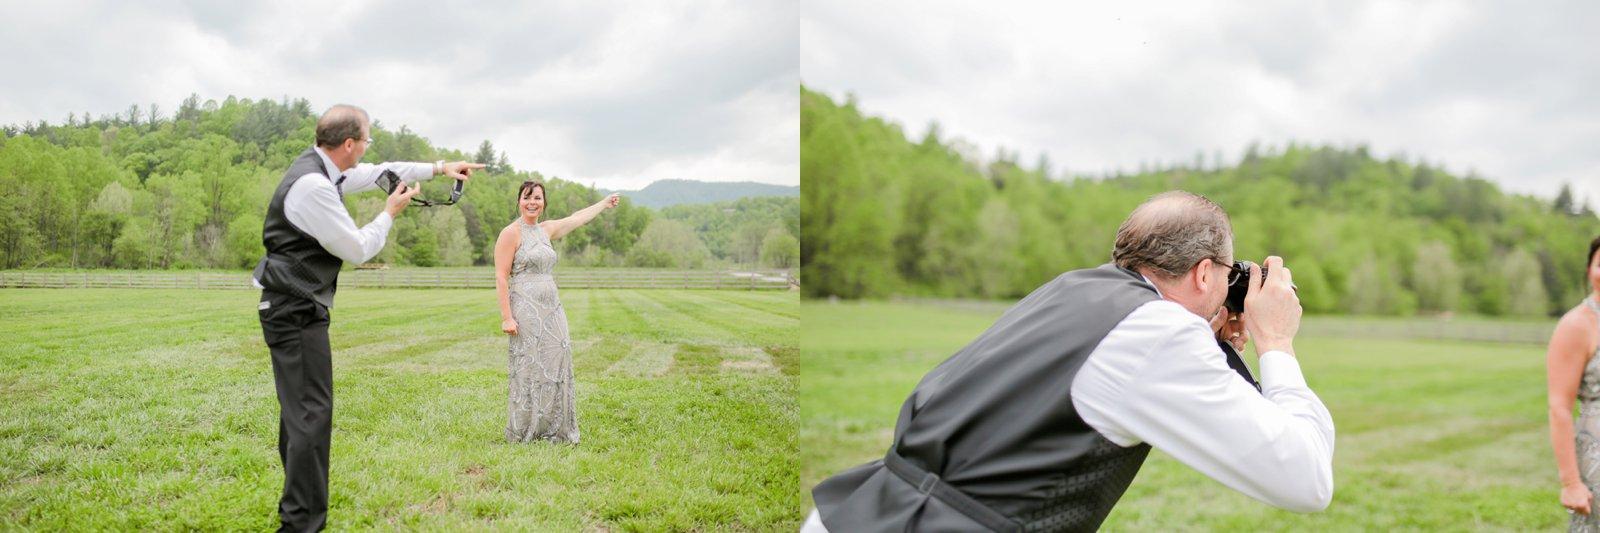 wedding_photographer_Missouri_Destination_elope_intimate_Saint_James_MO_Missouri_KansasCity_Jeff_City_Jefferson_Columbia_Engagement_Photos_Pictures_Session_Best_Videographer_0171.jpg